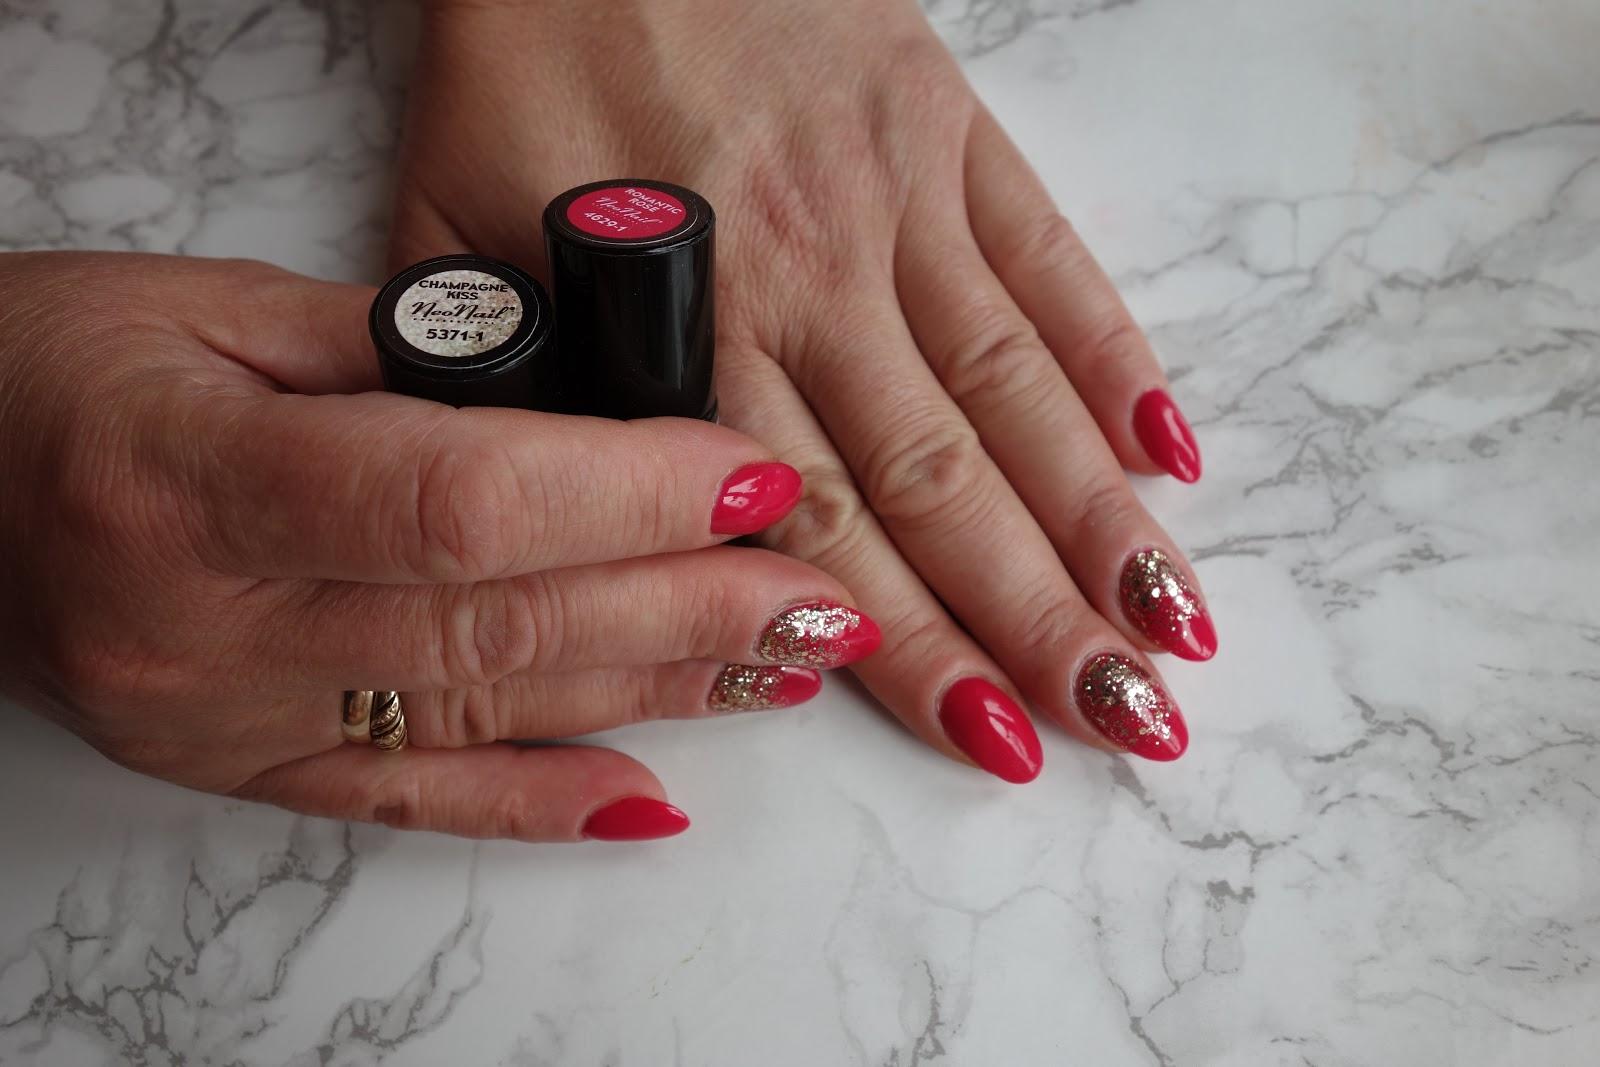 Neonail manicure hybrydowy - Romantic Rose & Champagne Kiss